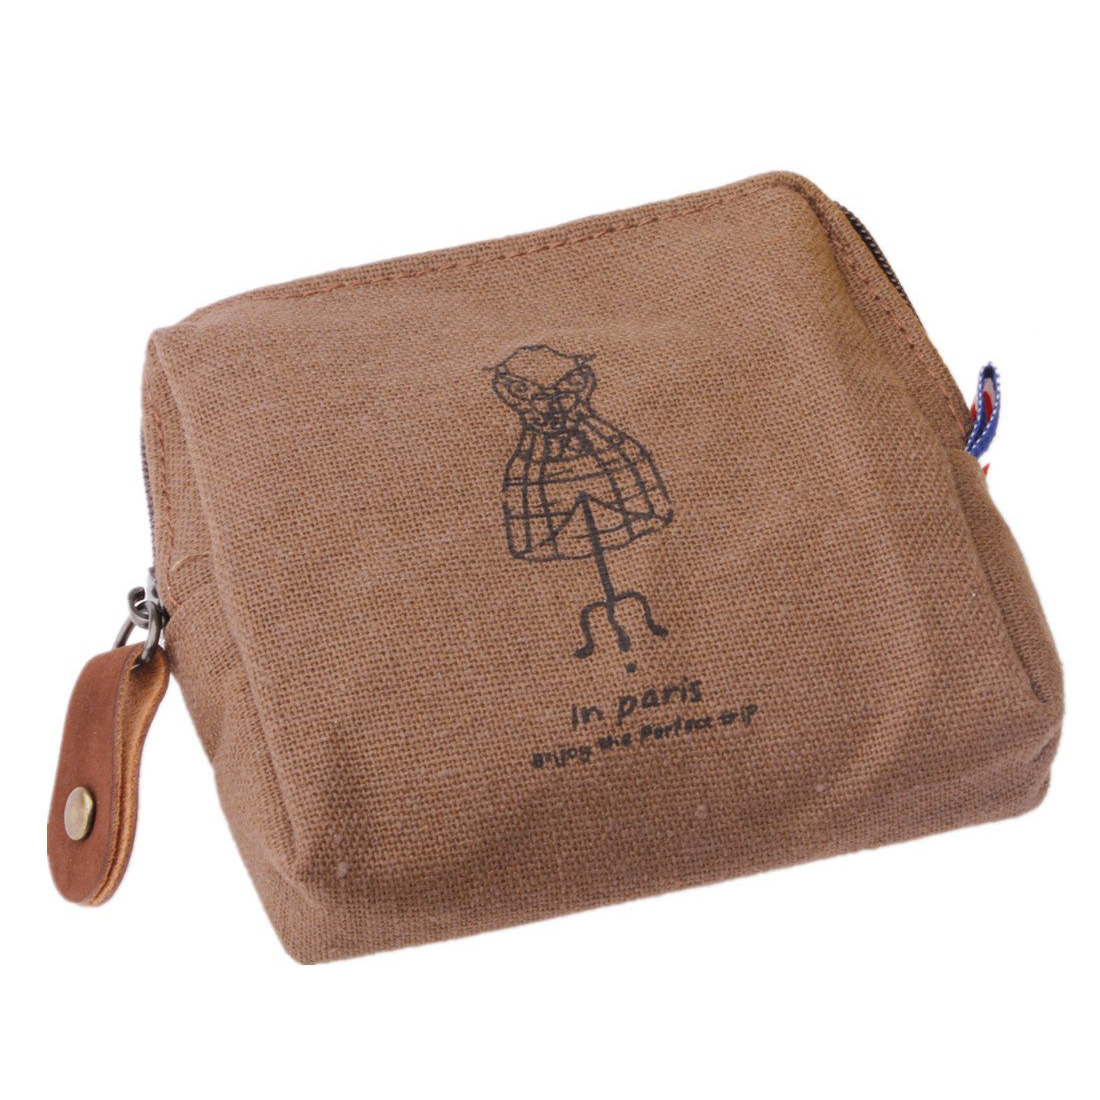 10pcs( ABDB Woman girl Retro portable purse bag pouch for key card Wallet Brown